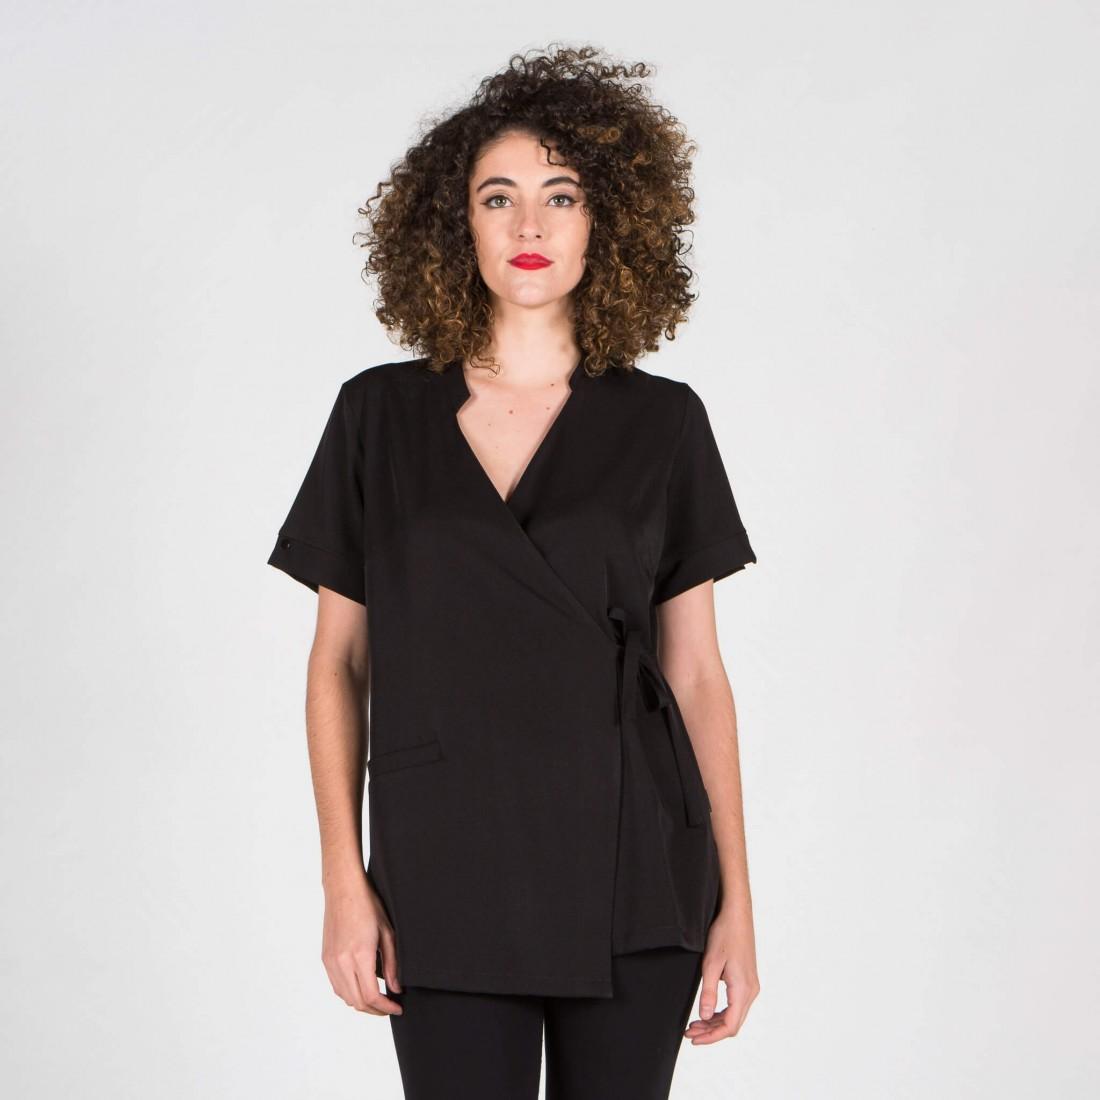 chaqueta de microfibra de color negro